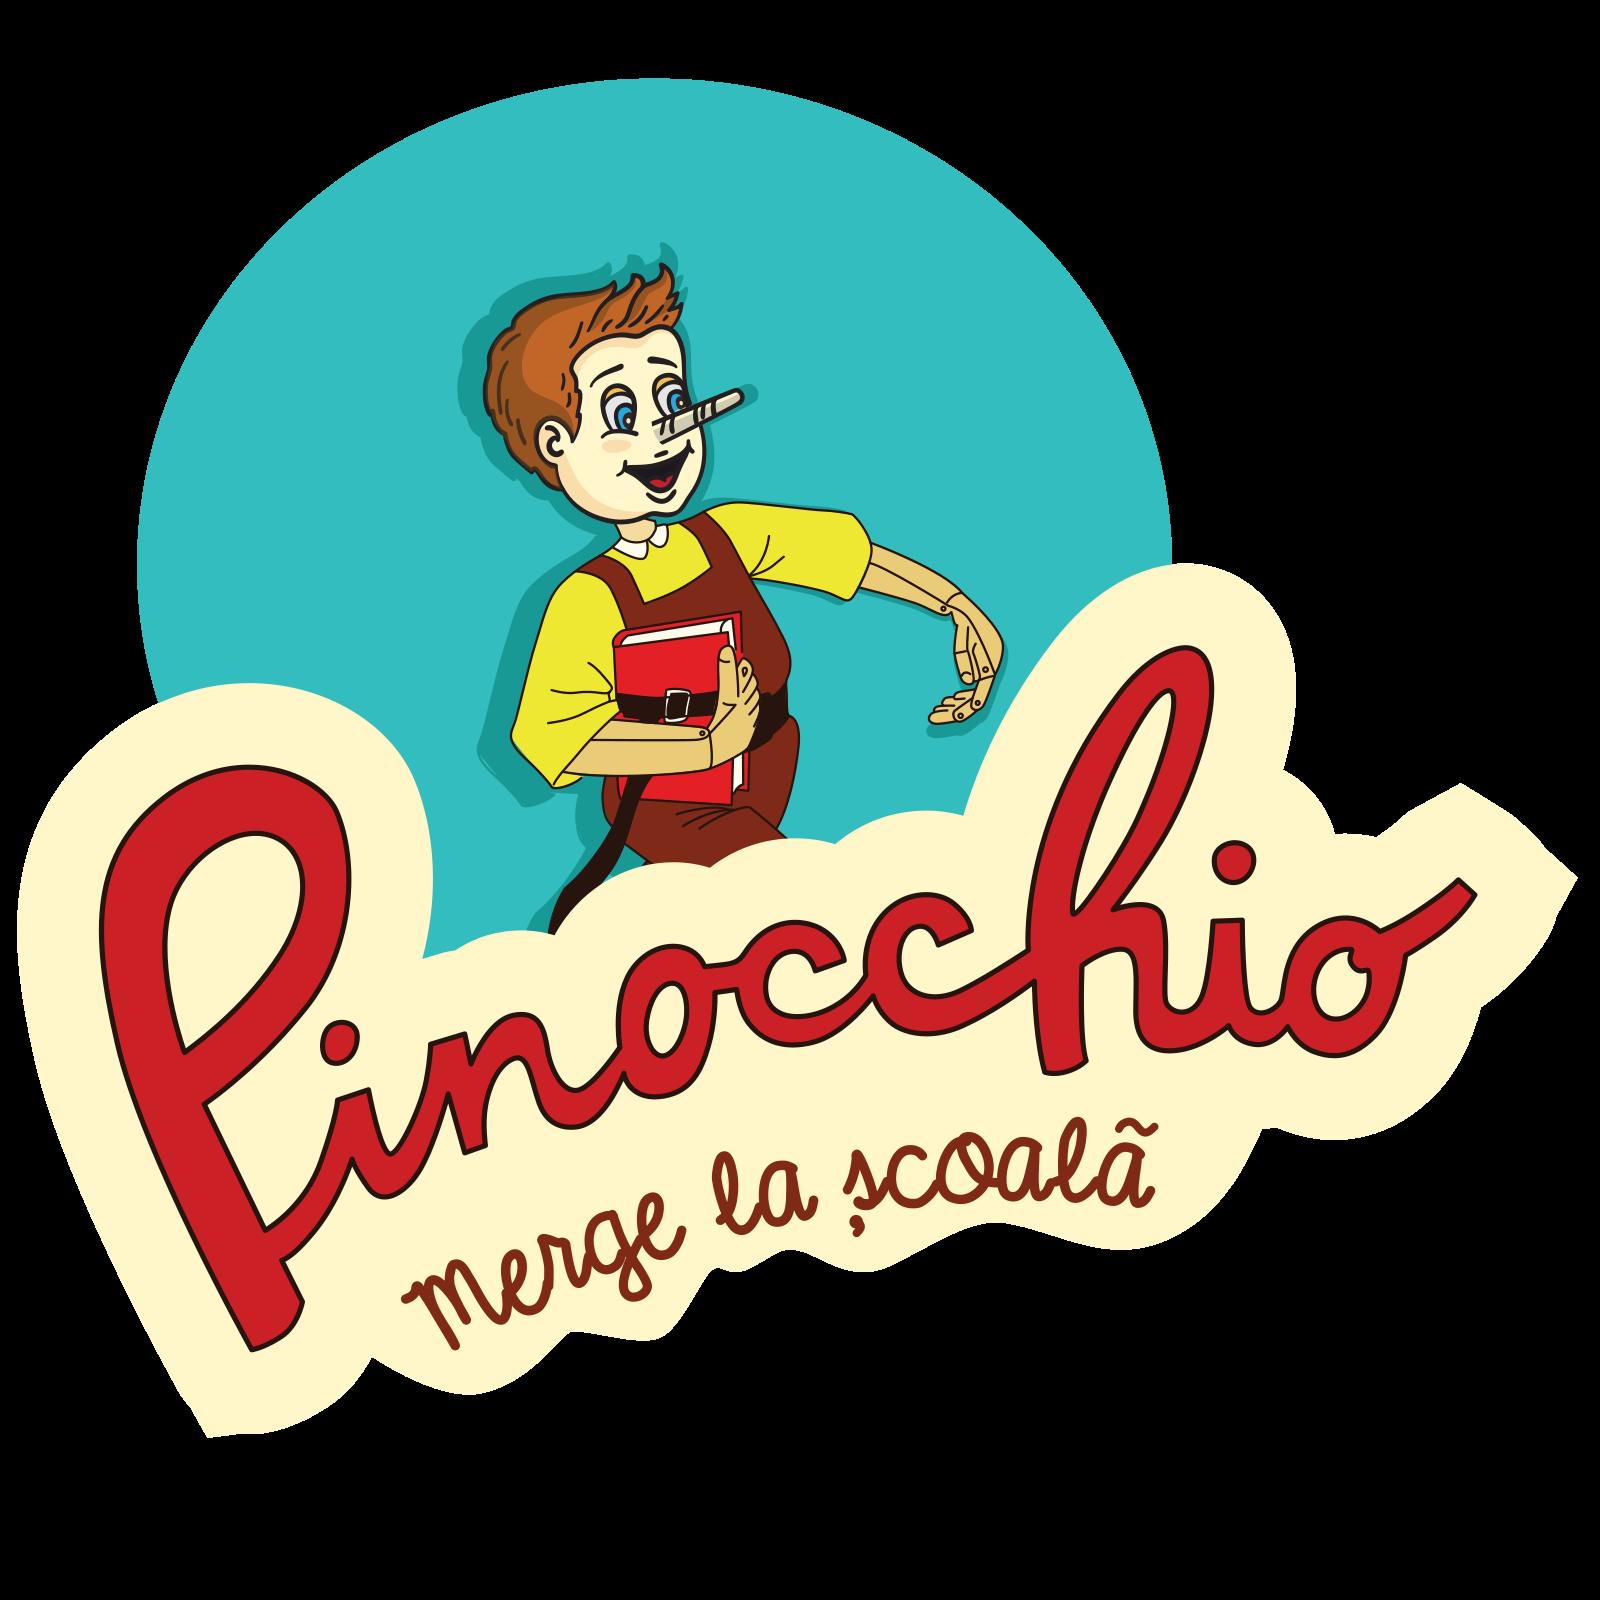 Pinocchio merge la scoala